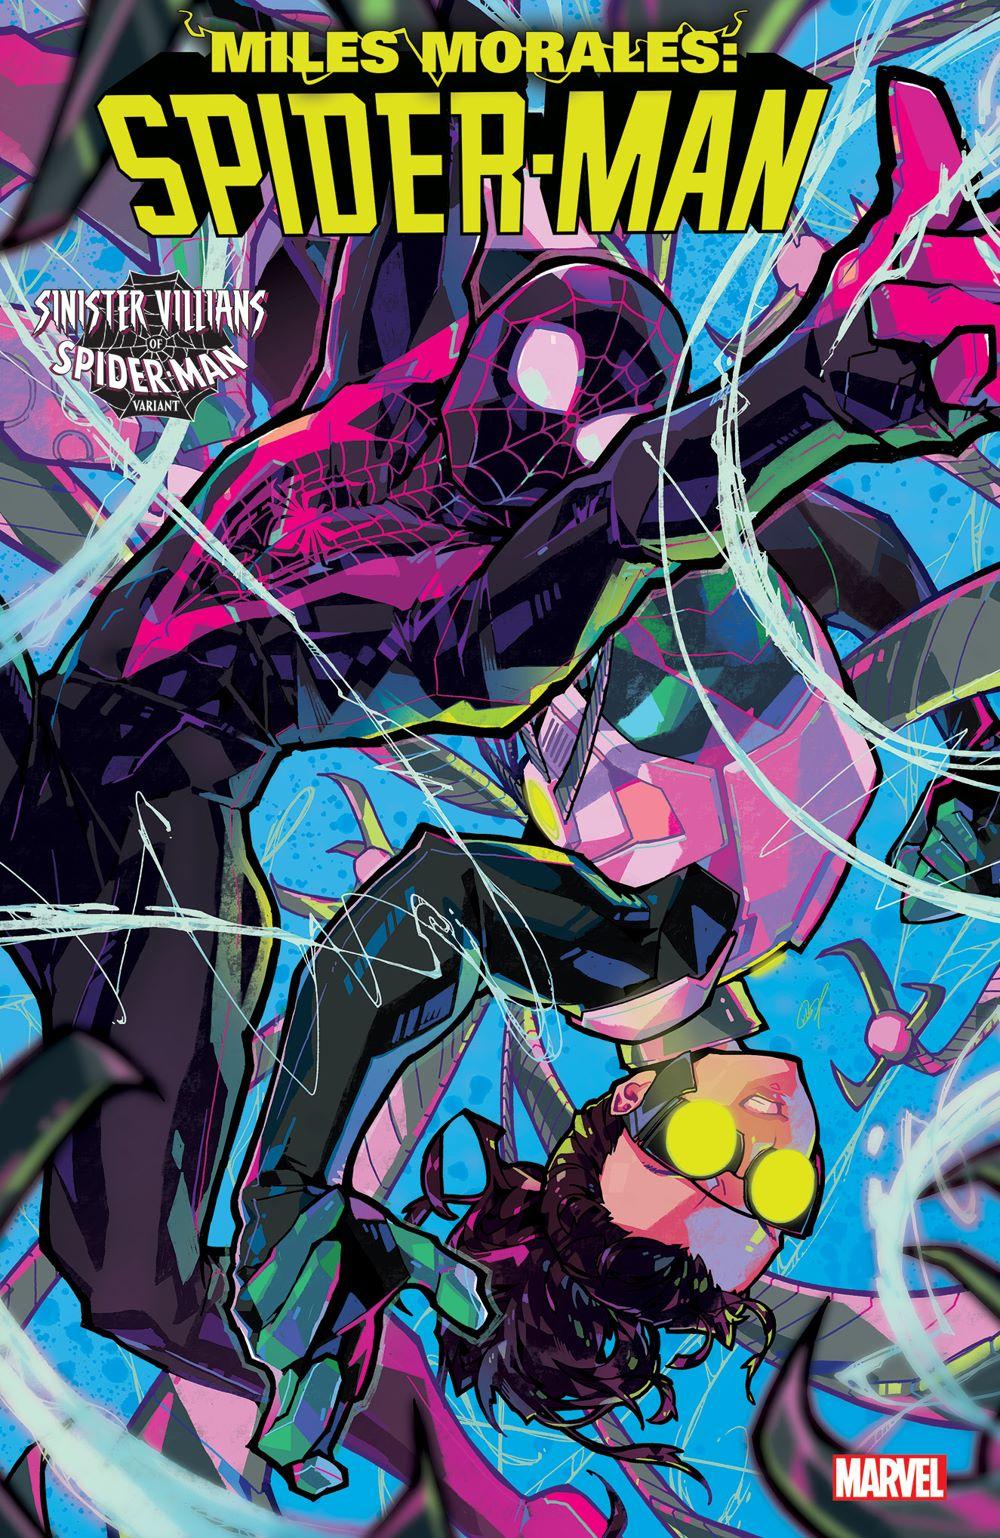 MMSM2018027_SM_Villains_Variant Spider-Man's villains conquer variant covers this June